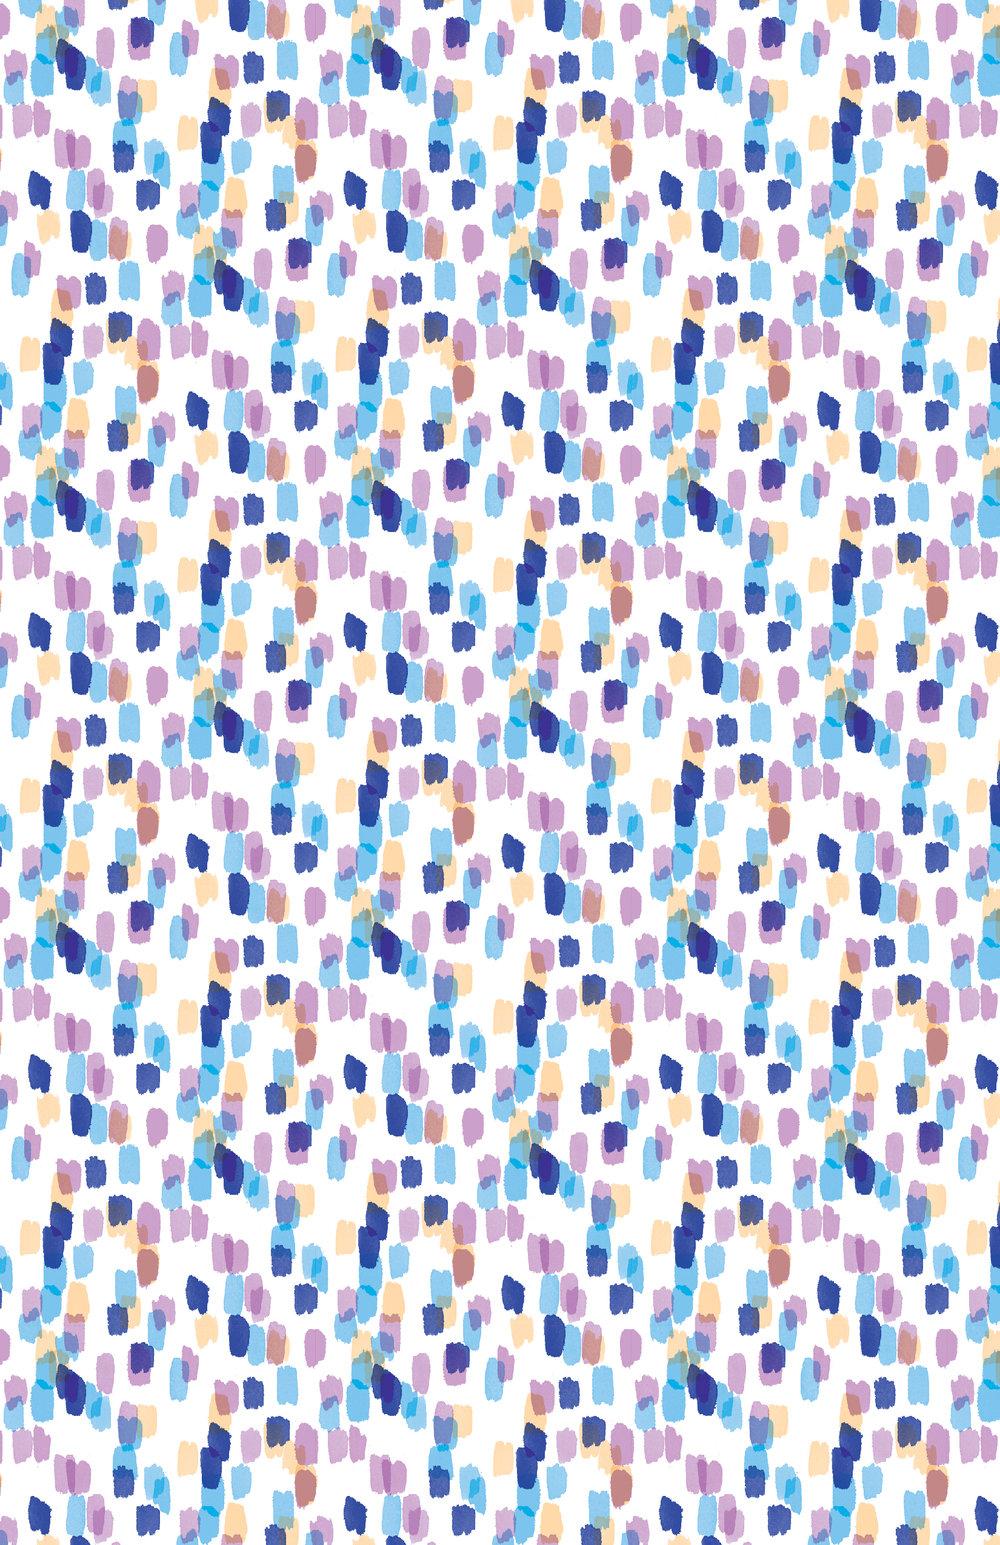 pattern46-01.jpg